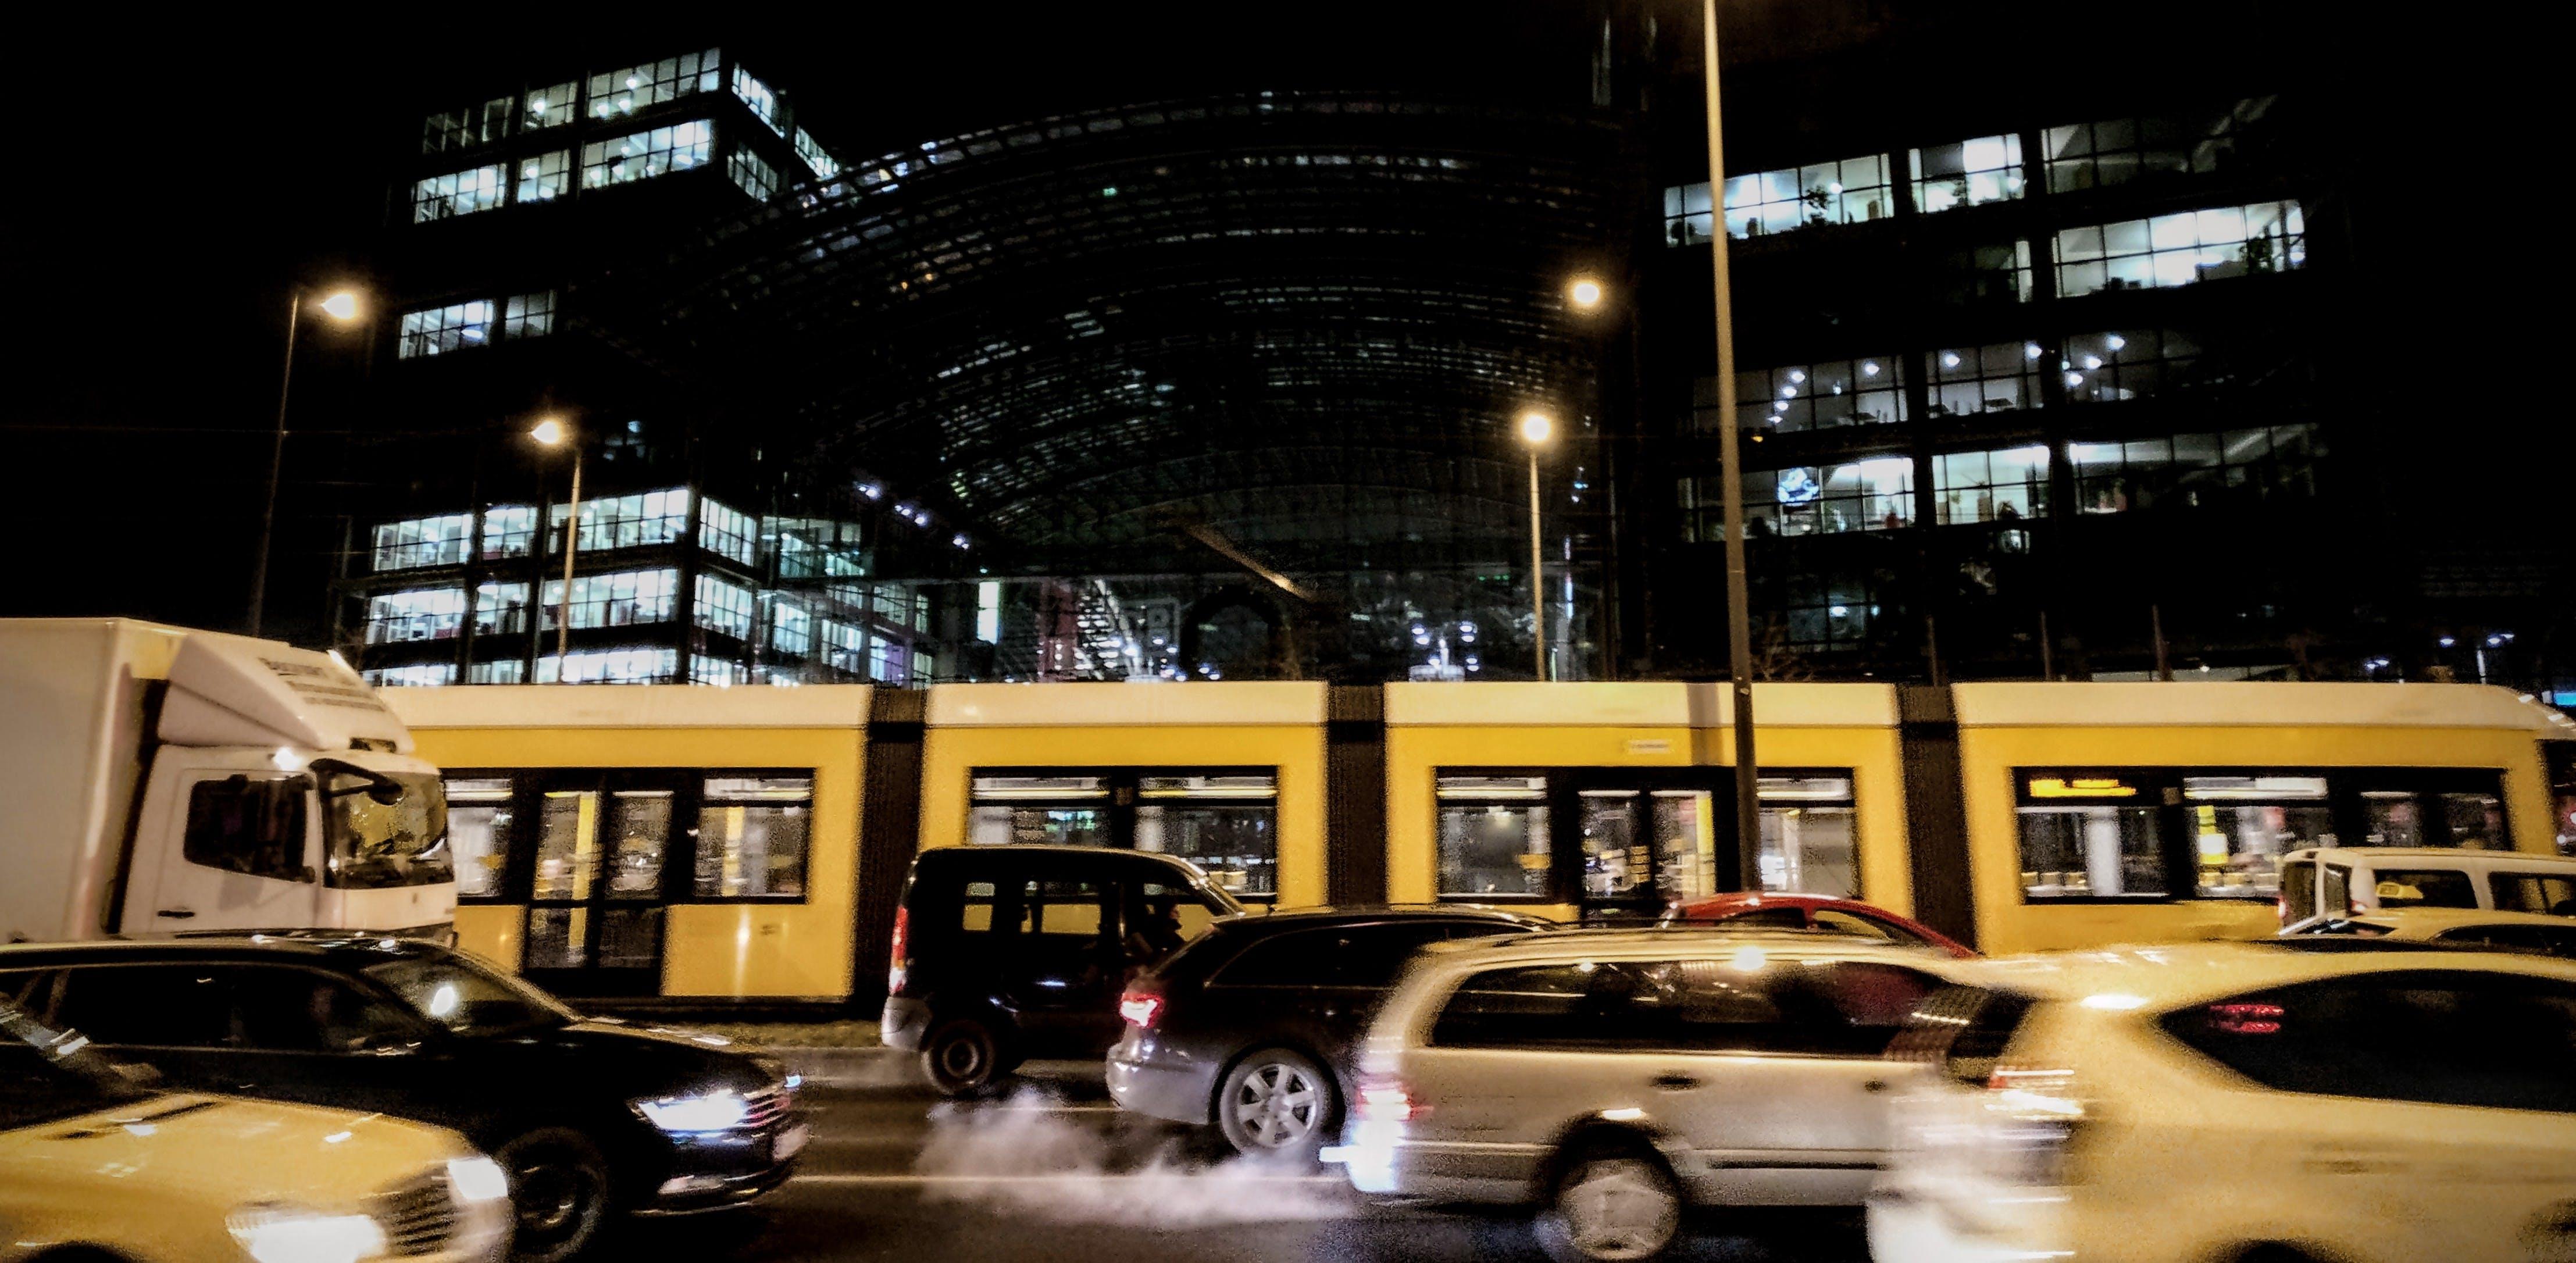 architecture, blur, bus